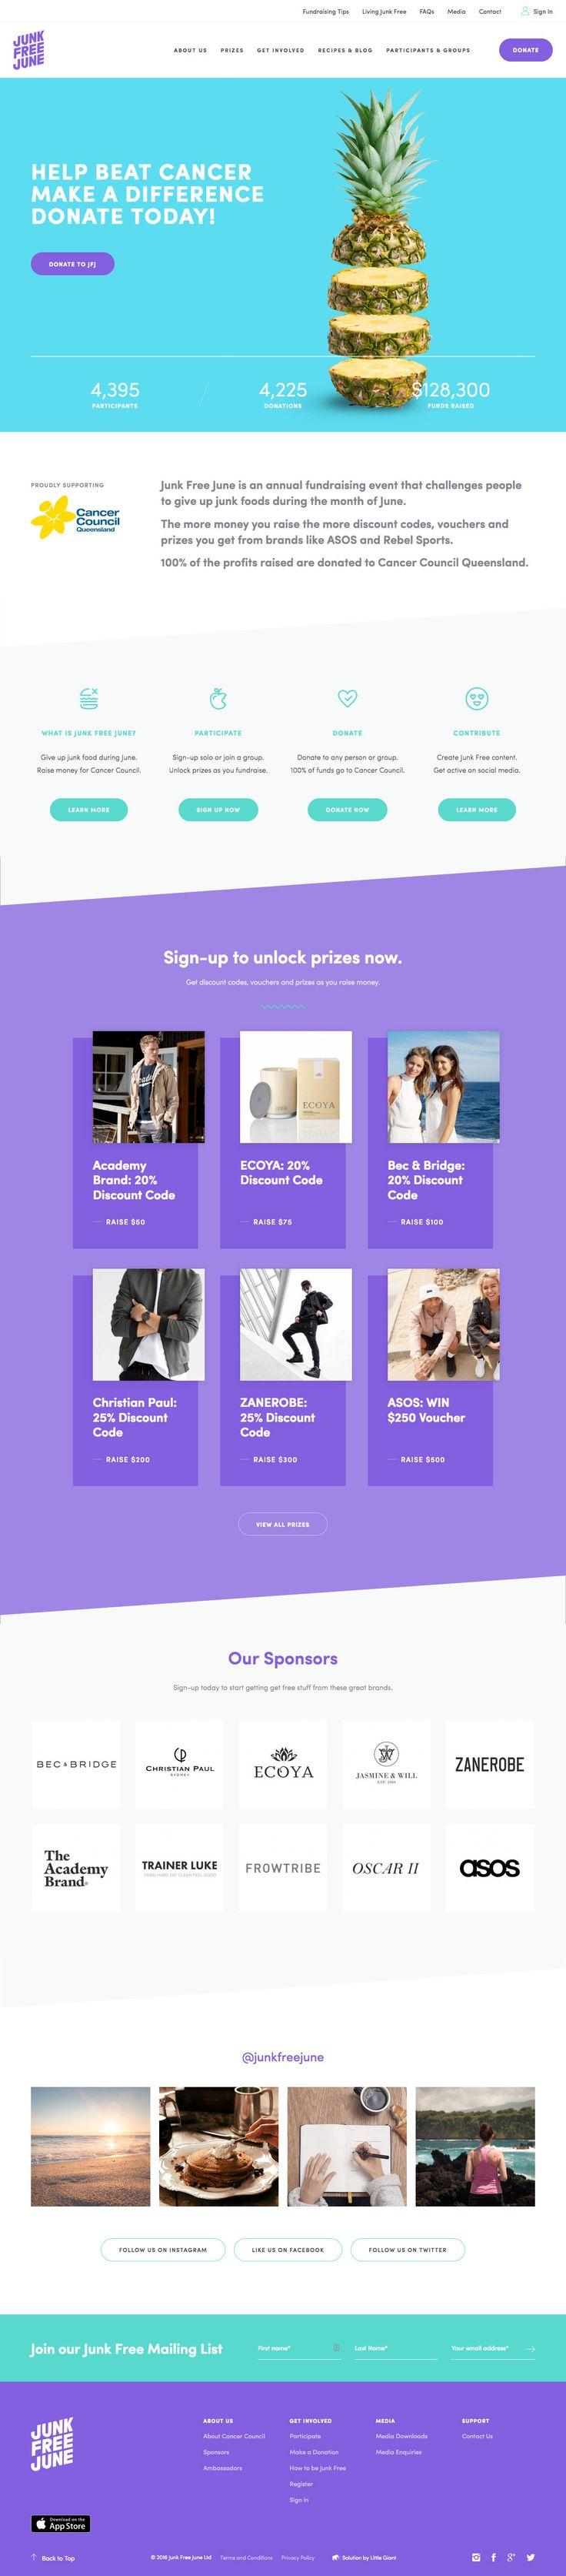 Junk Free June (More web design inspiration at topdesigninspiration.com) #design…